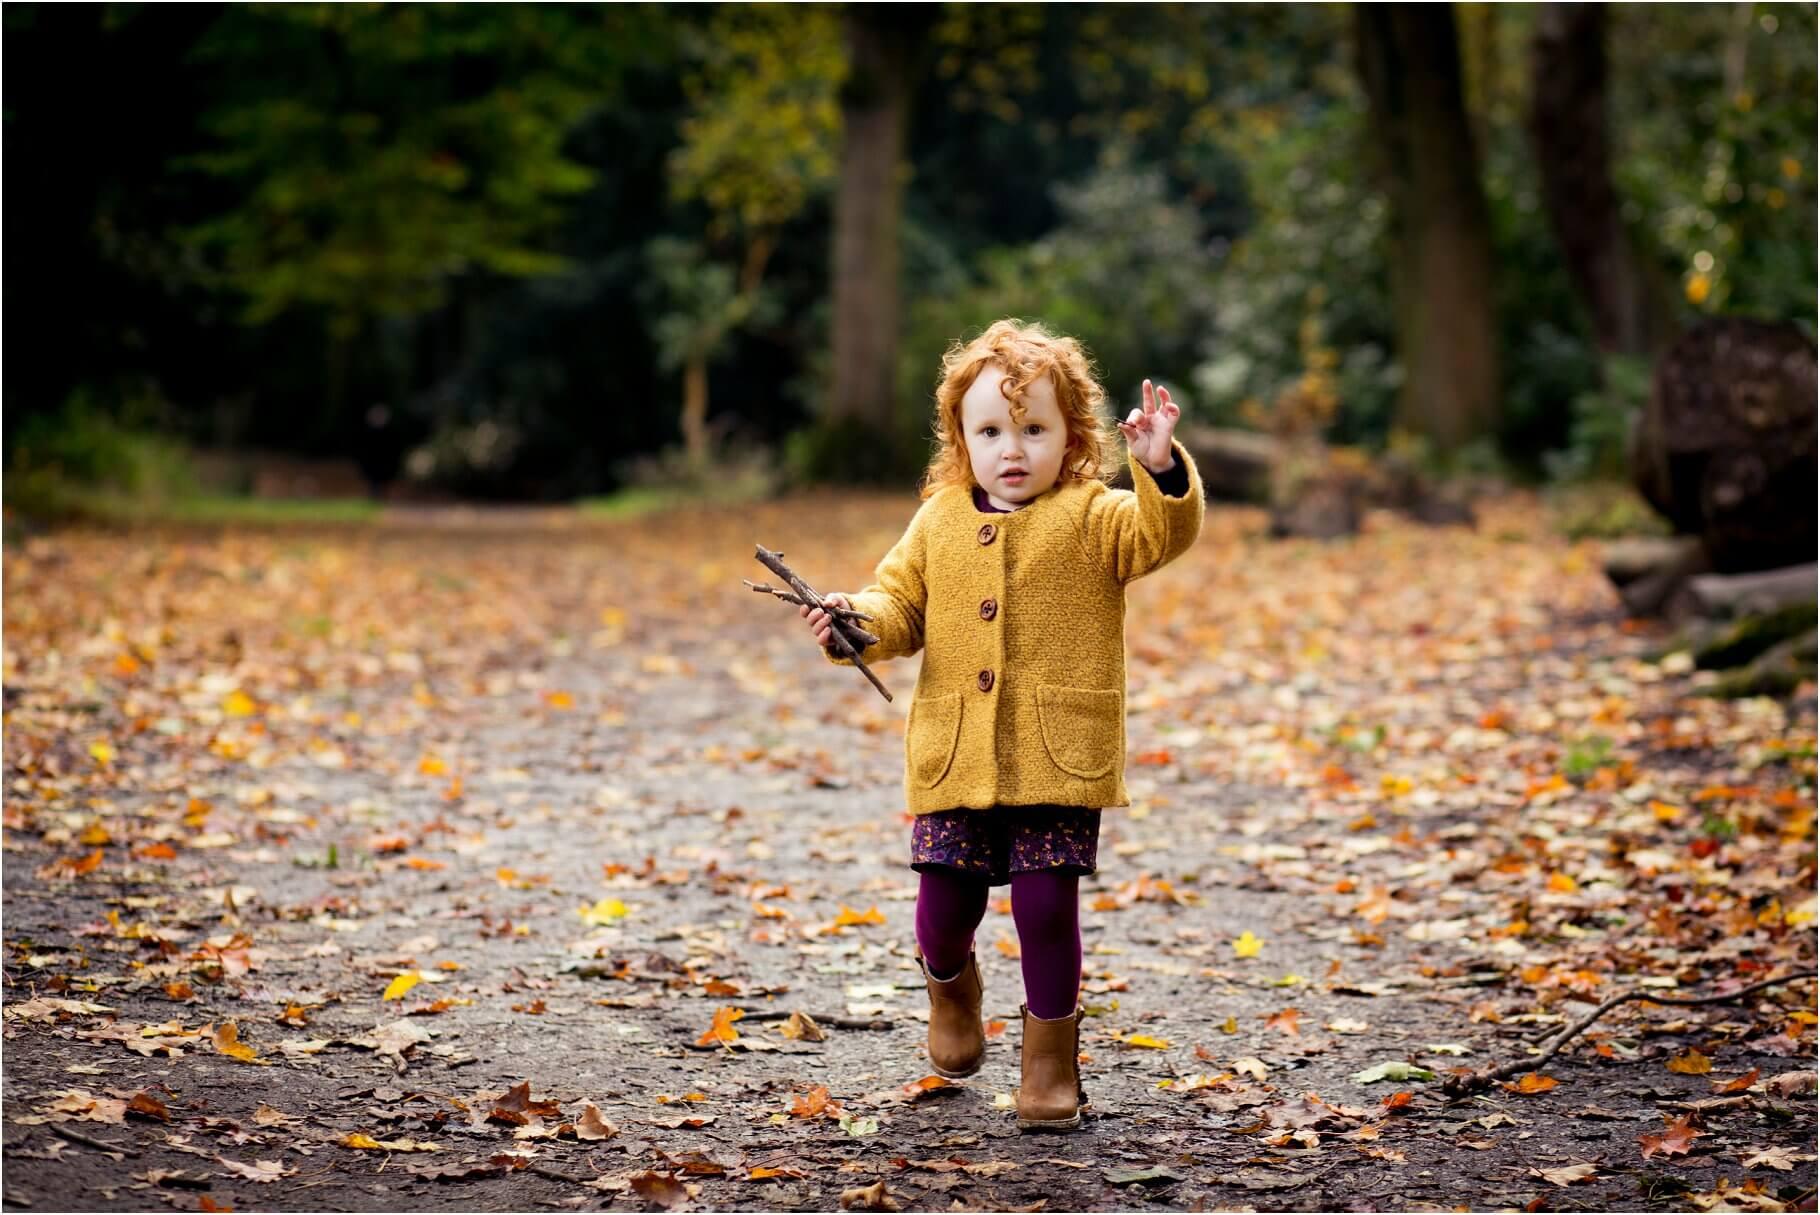 Autumn Photoshoot Towneley Park